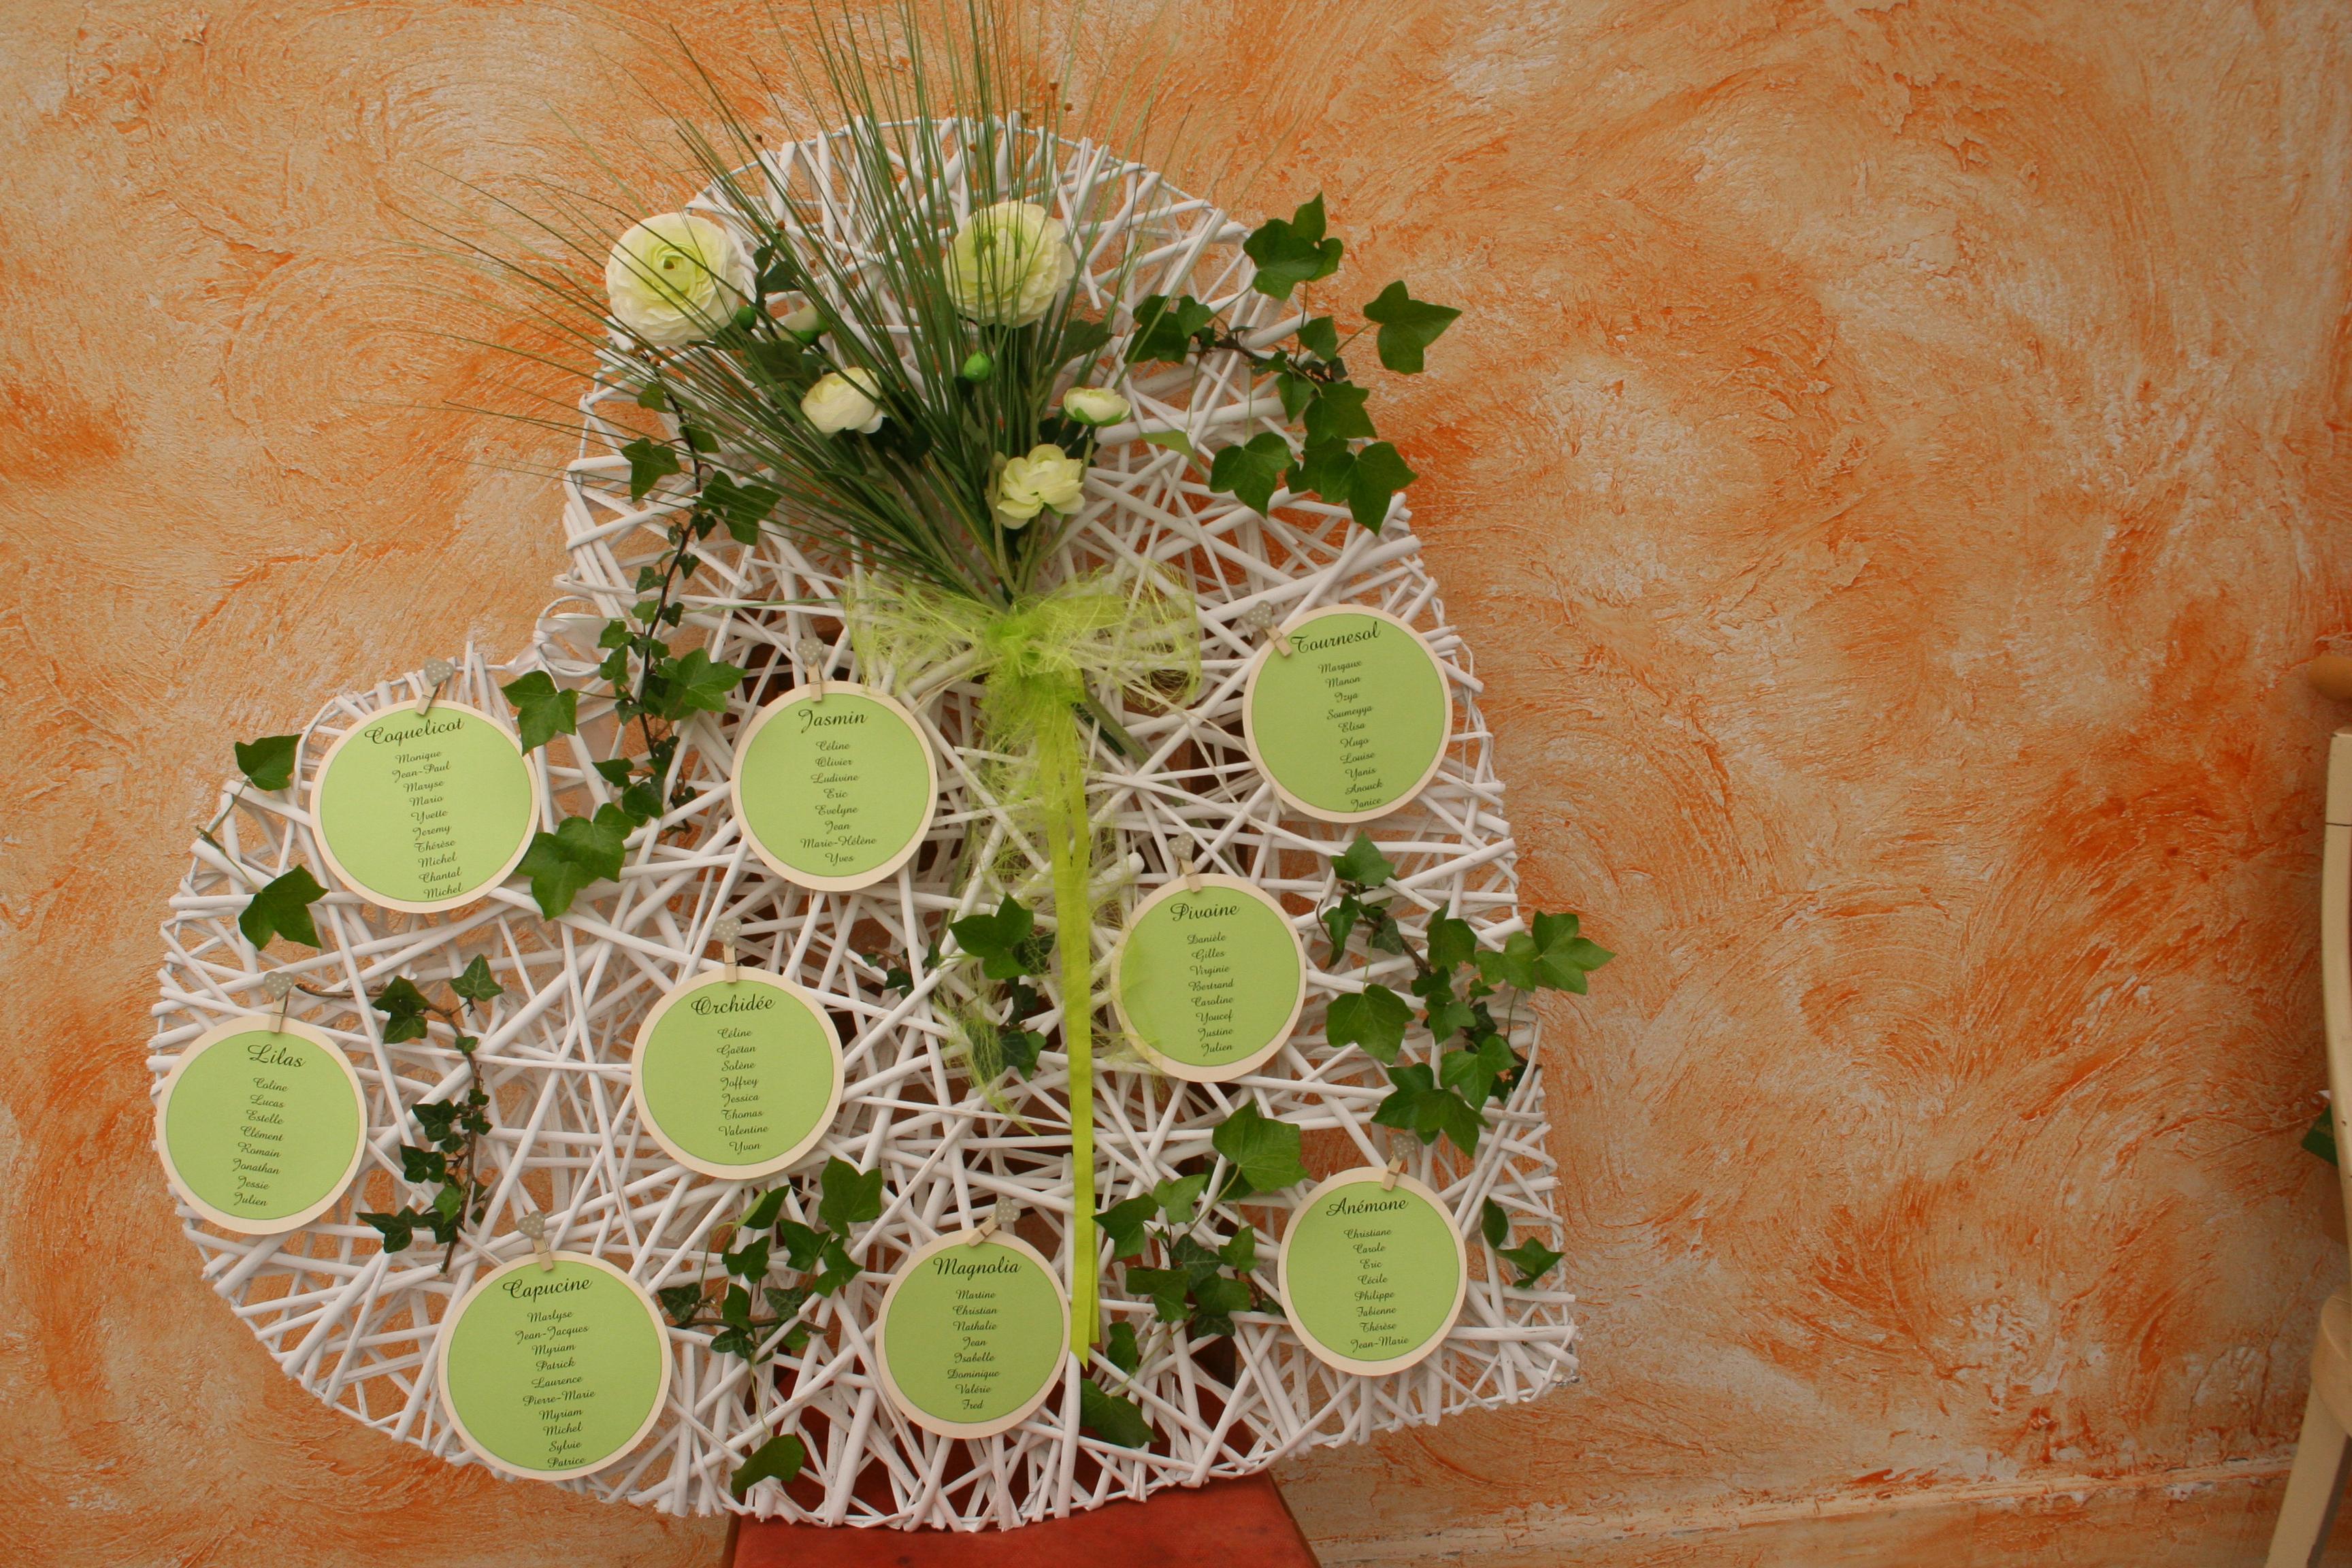 Coeur en rotin plan de table ventes mariage cece59210 - Plan de table coeur mariage ...